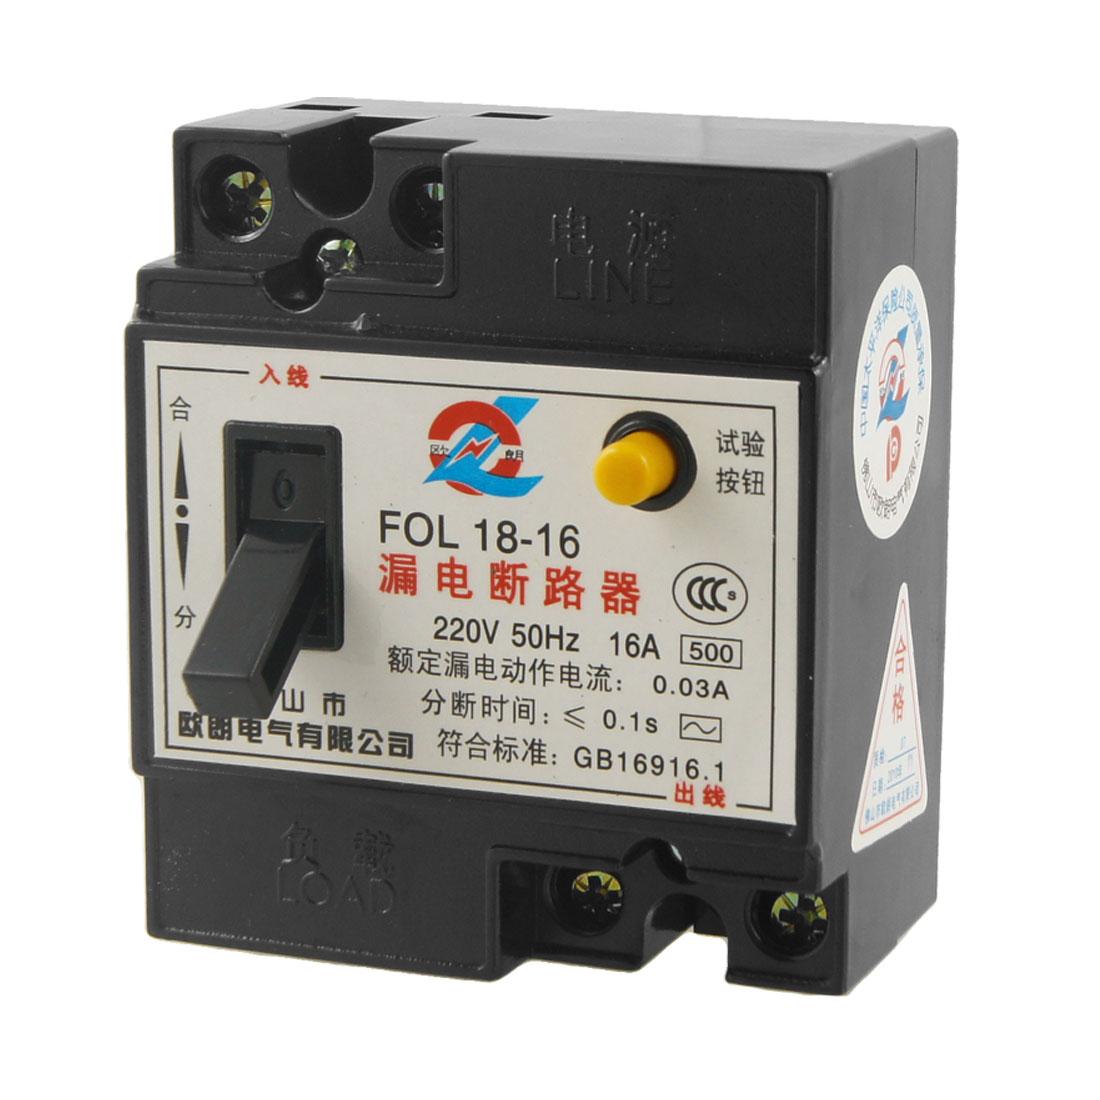 220V AC 16A 2P RCCB FOL18-16 Residual Current Circuit Breaker